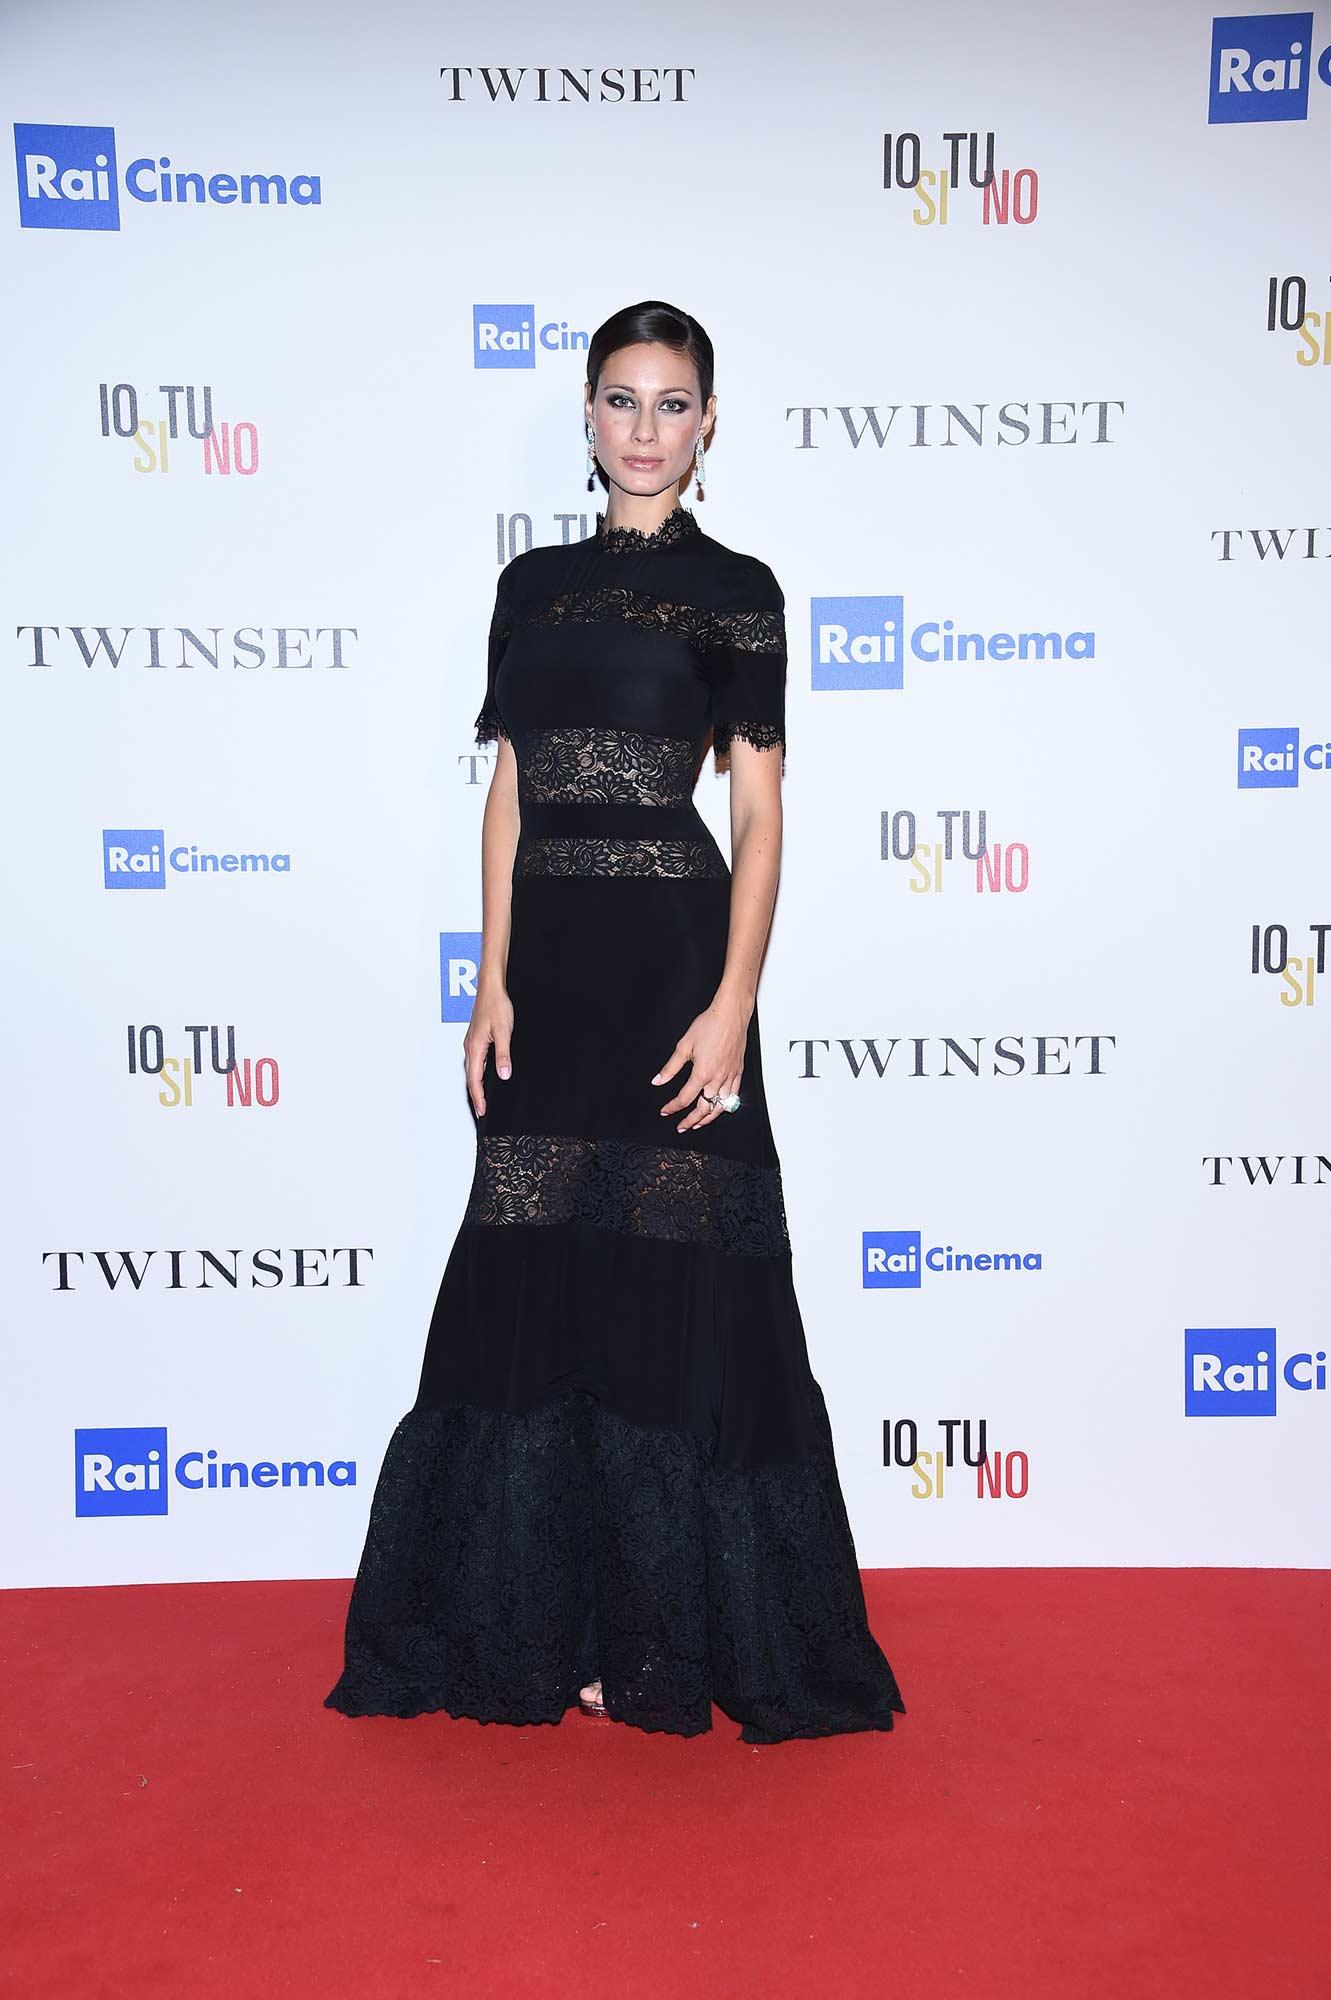 Venezia 2017 - Twinset shortfilm premiere - Marica Pellegrinelli - Hair & Makeup Massimo Serini